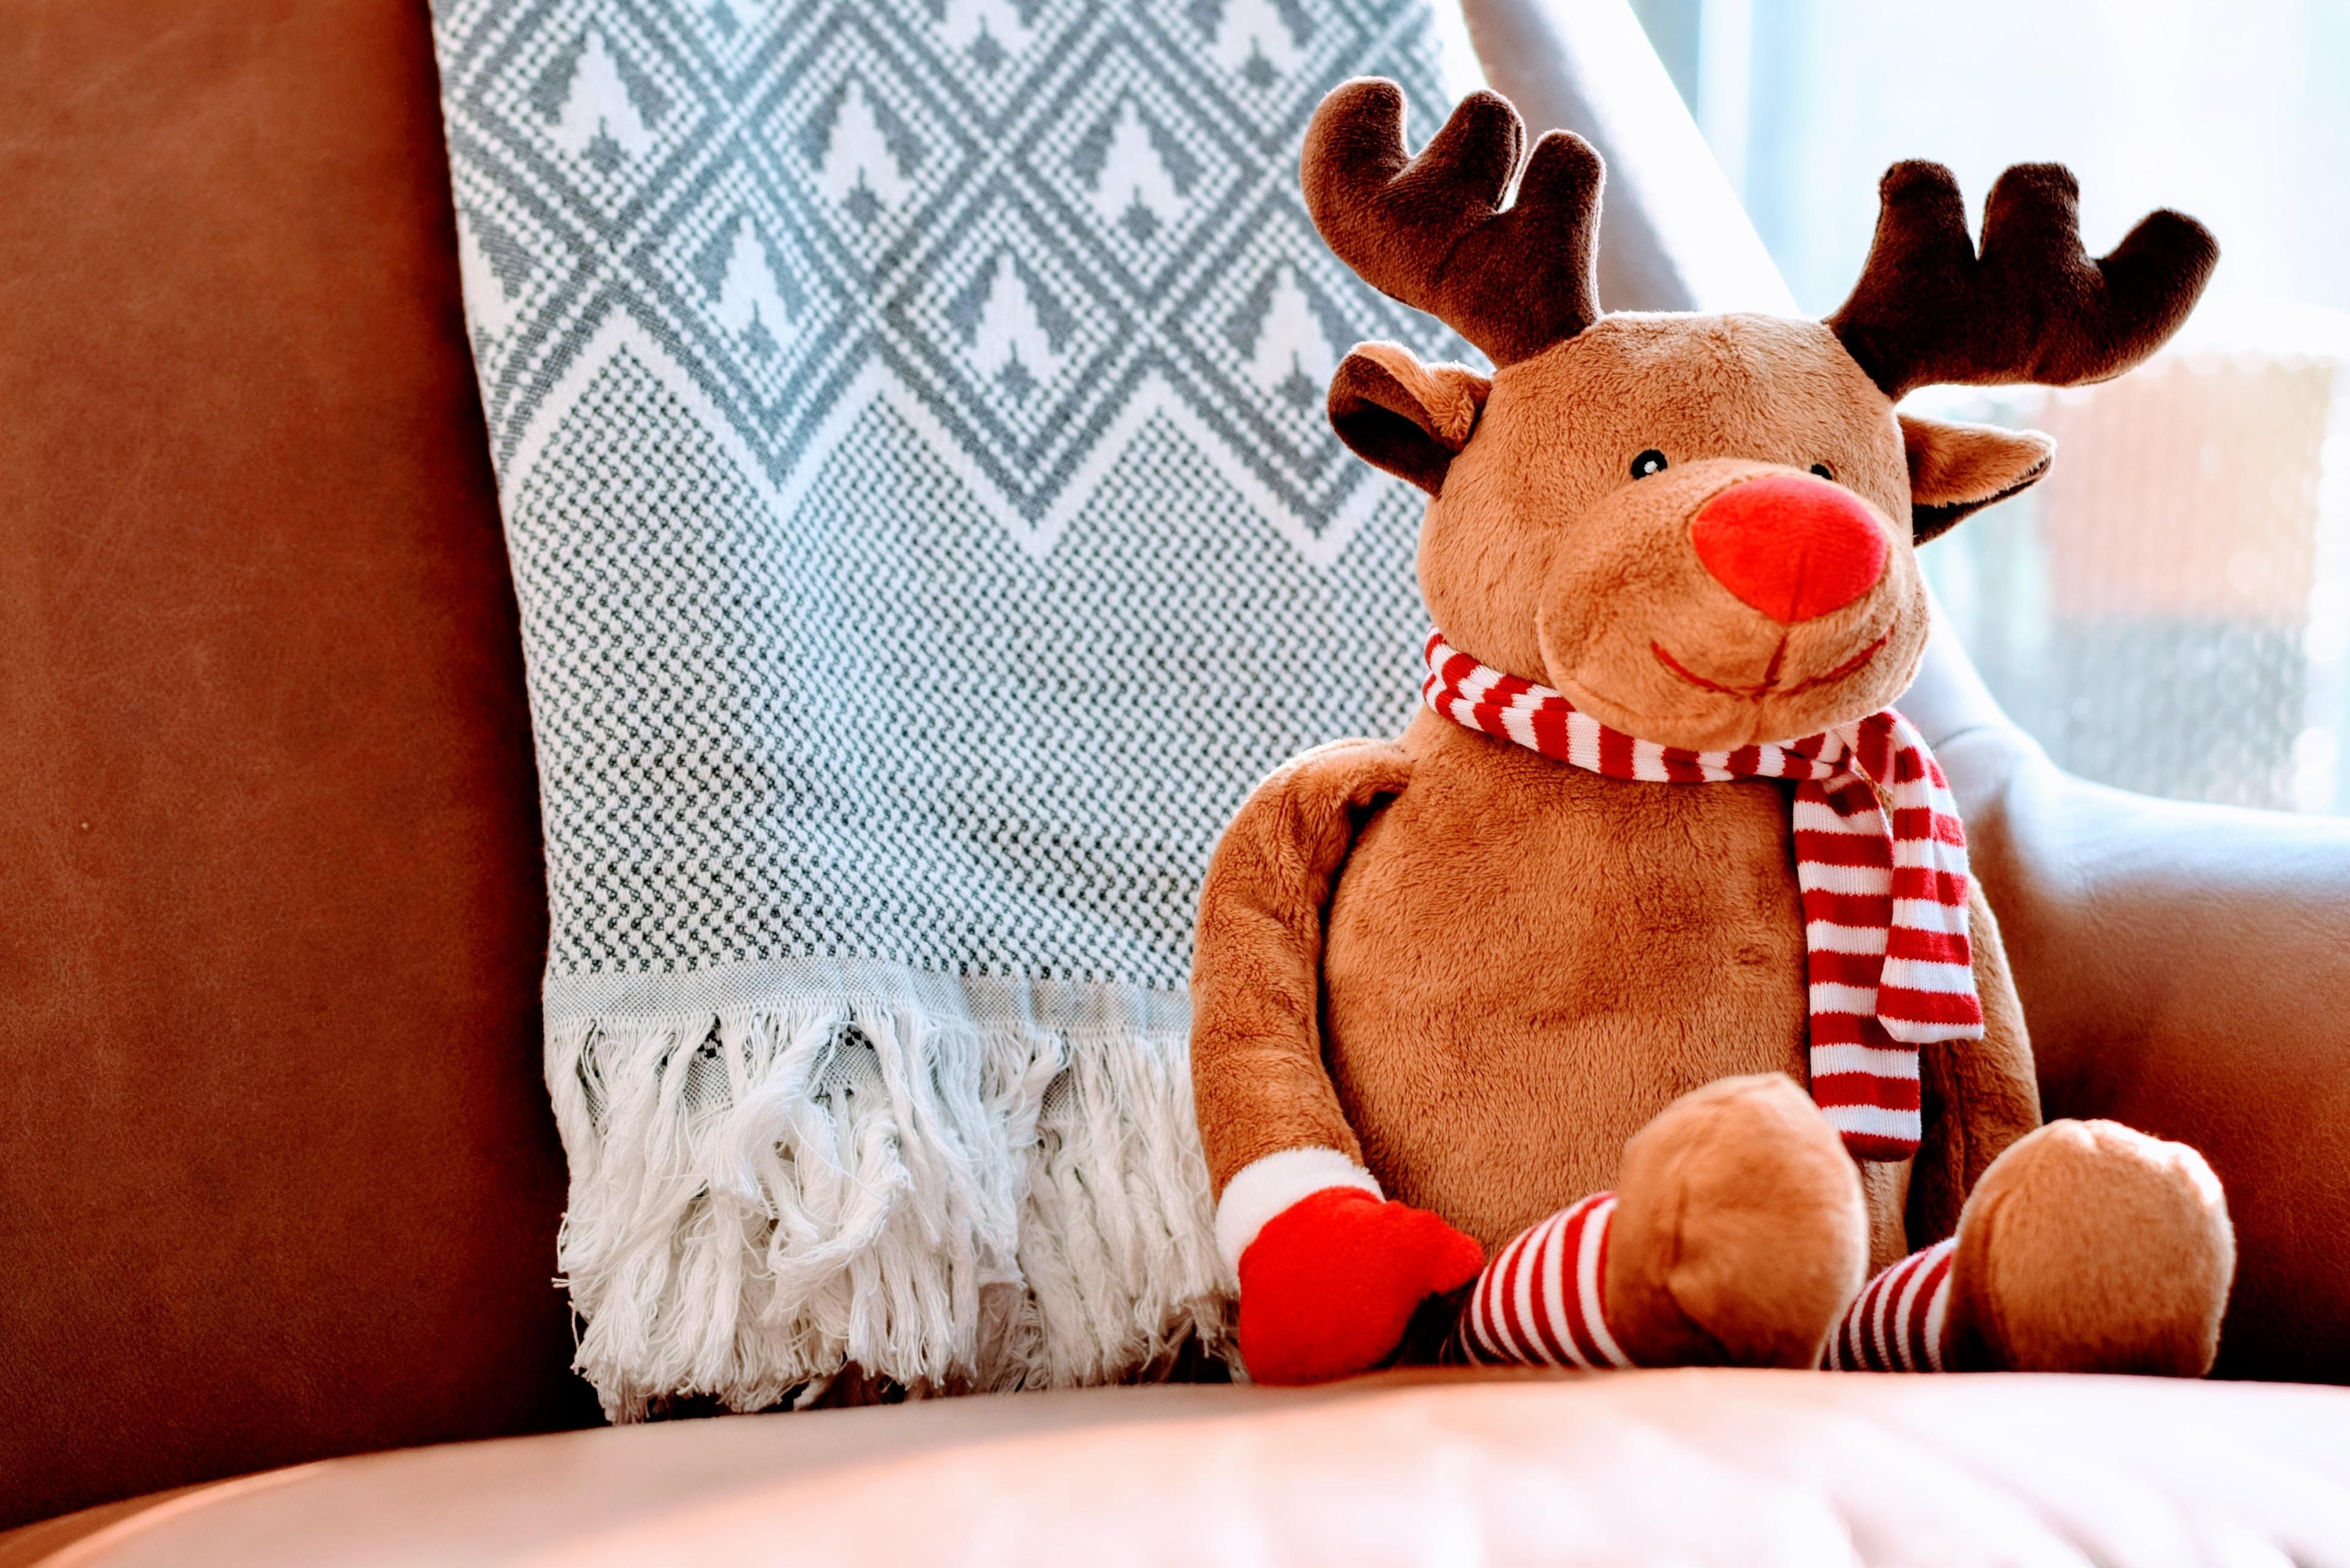 Stuffed animals stories